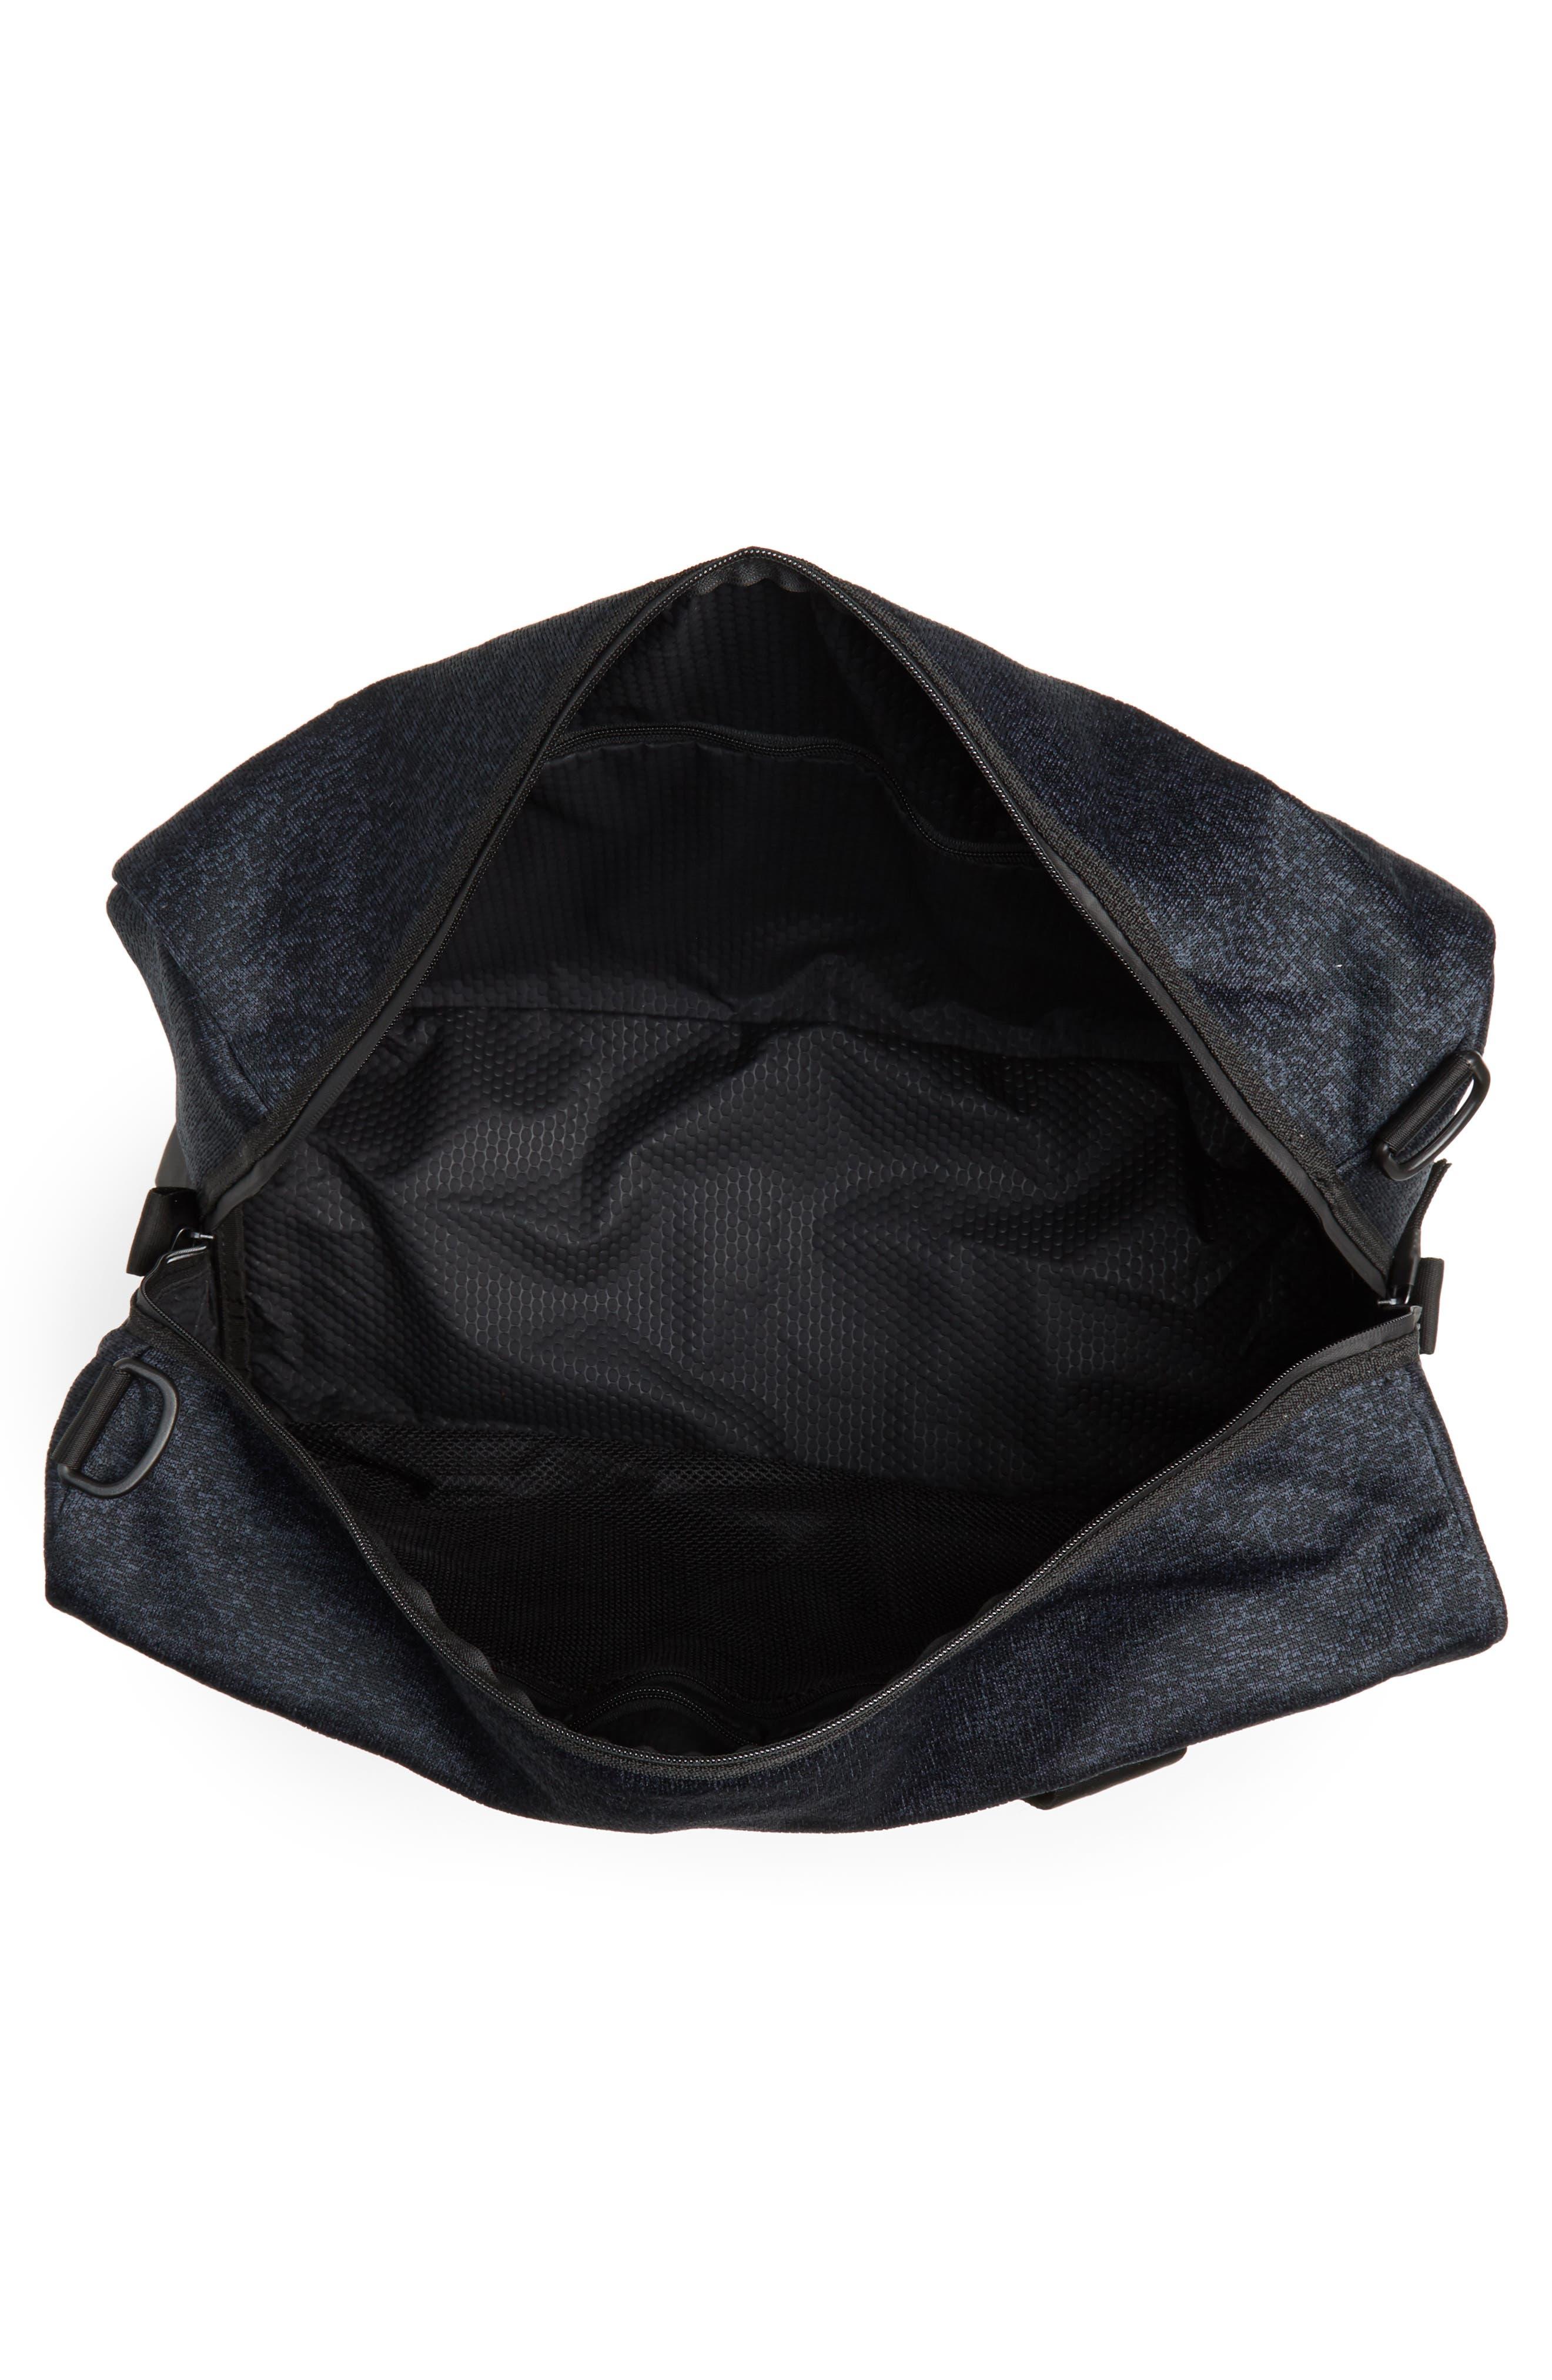 ADIDAS ORIGINALS, PK Amplifier Duffle Bag, Alternate thumbnail 4, color, GREY/ BLACK